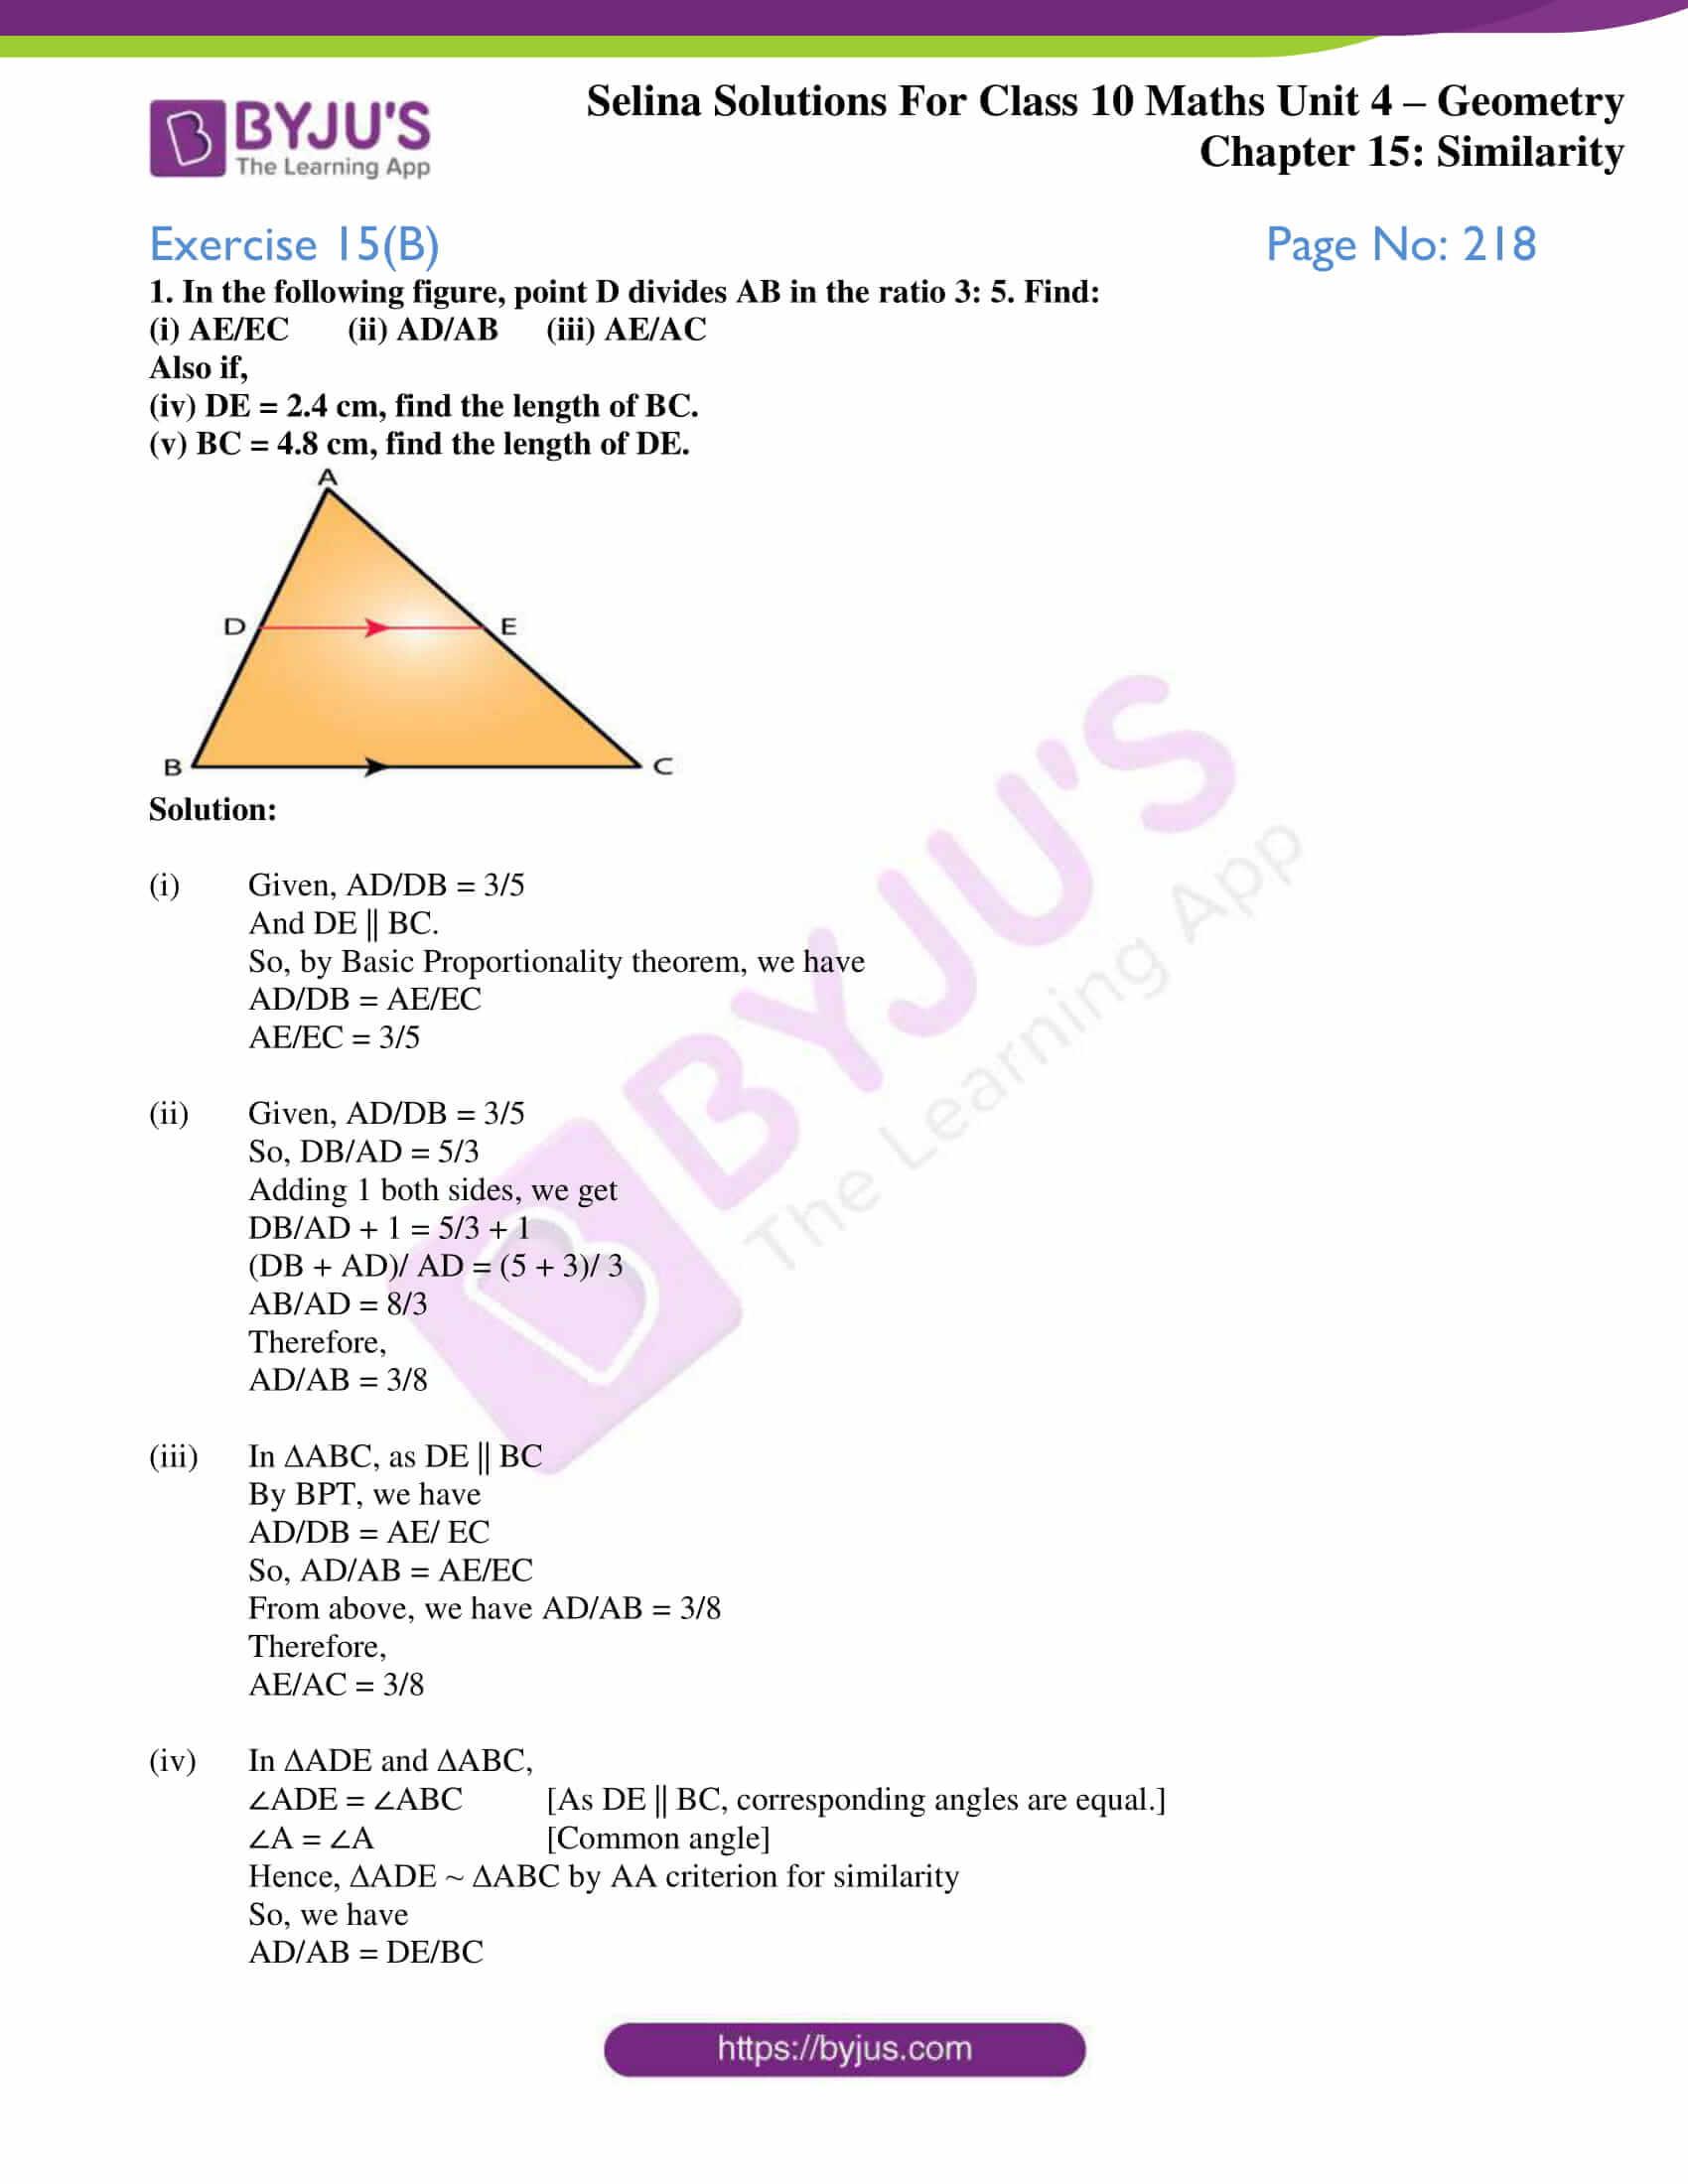 selina-sol-maths-class-10-ch-15-ex-b-1